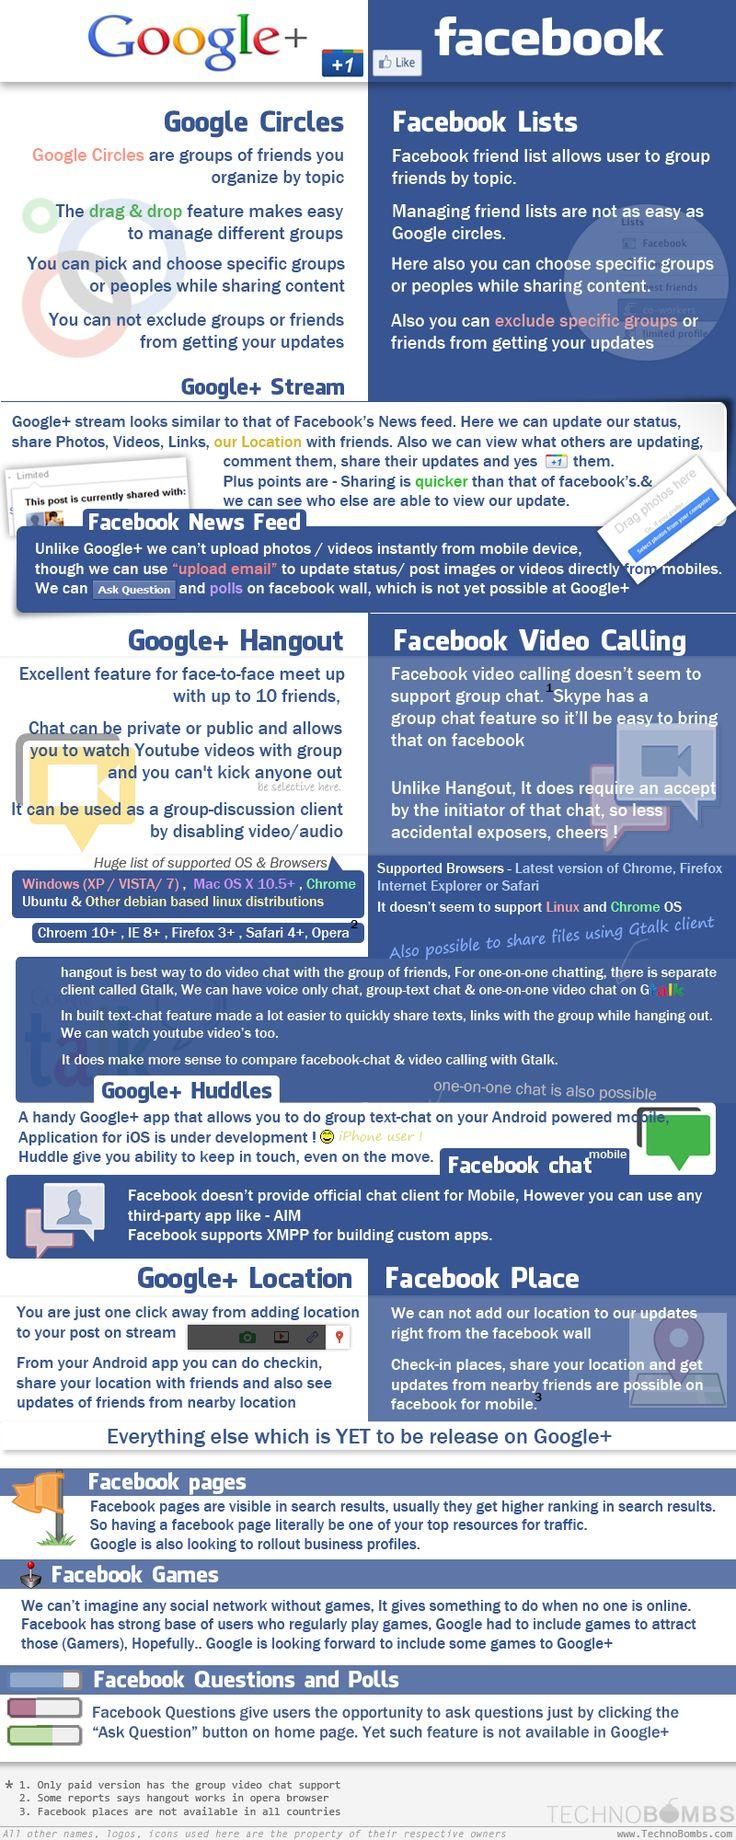 Google Circles vs. Facebook Lists - Great Summary for Strategic Marketers #marketing #facebook #google